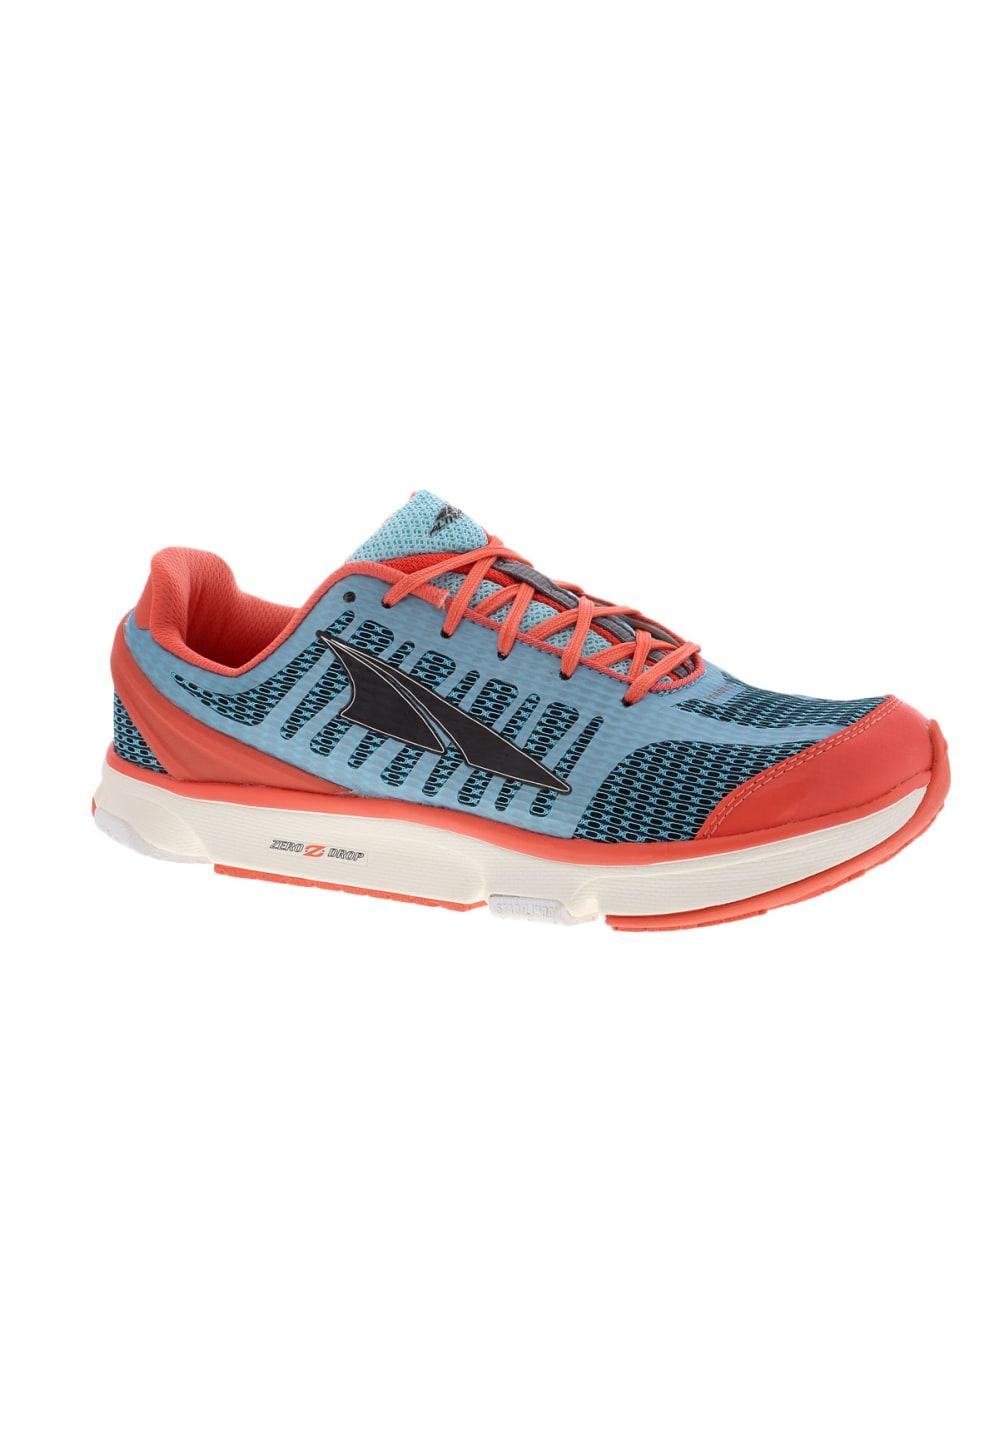 Altra Provision 2 Femmes Chaussures running